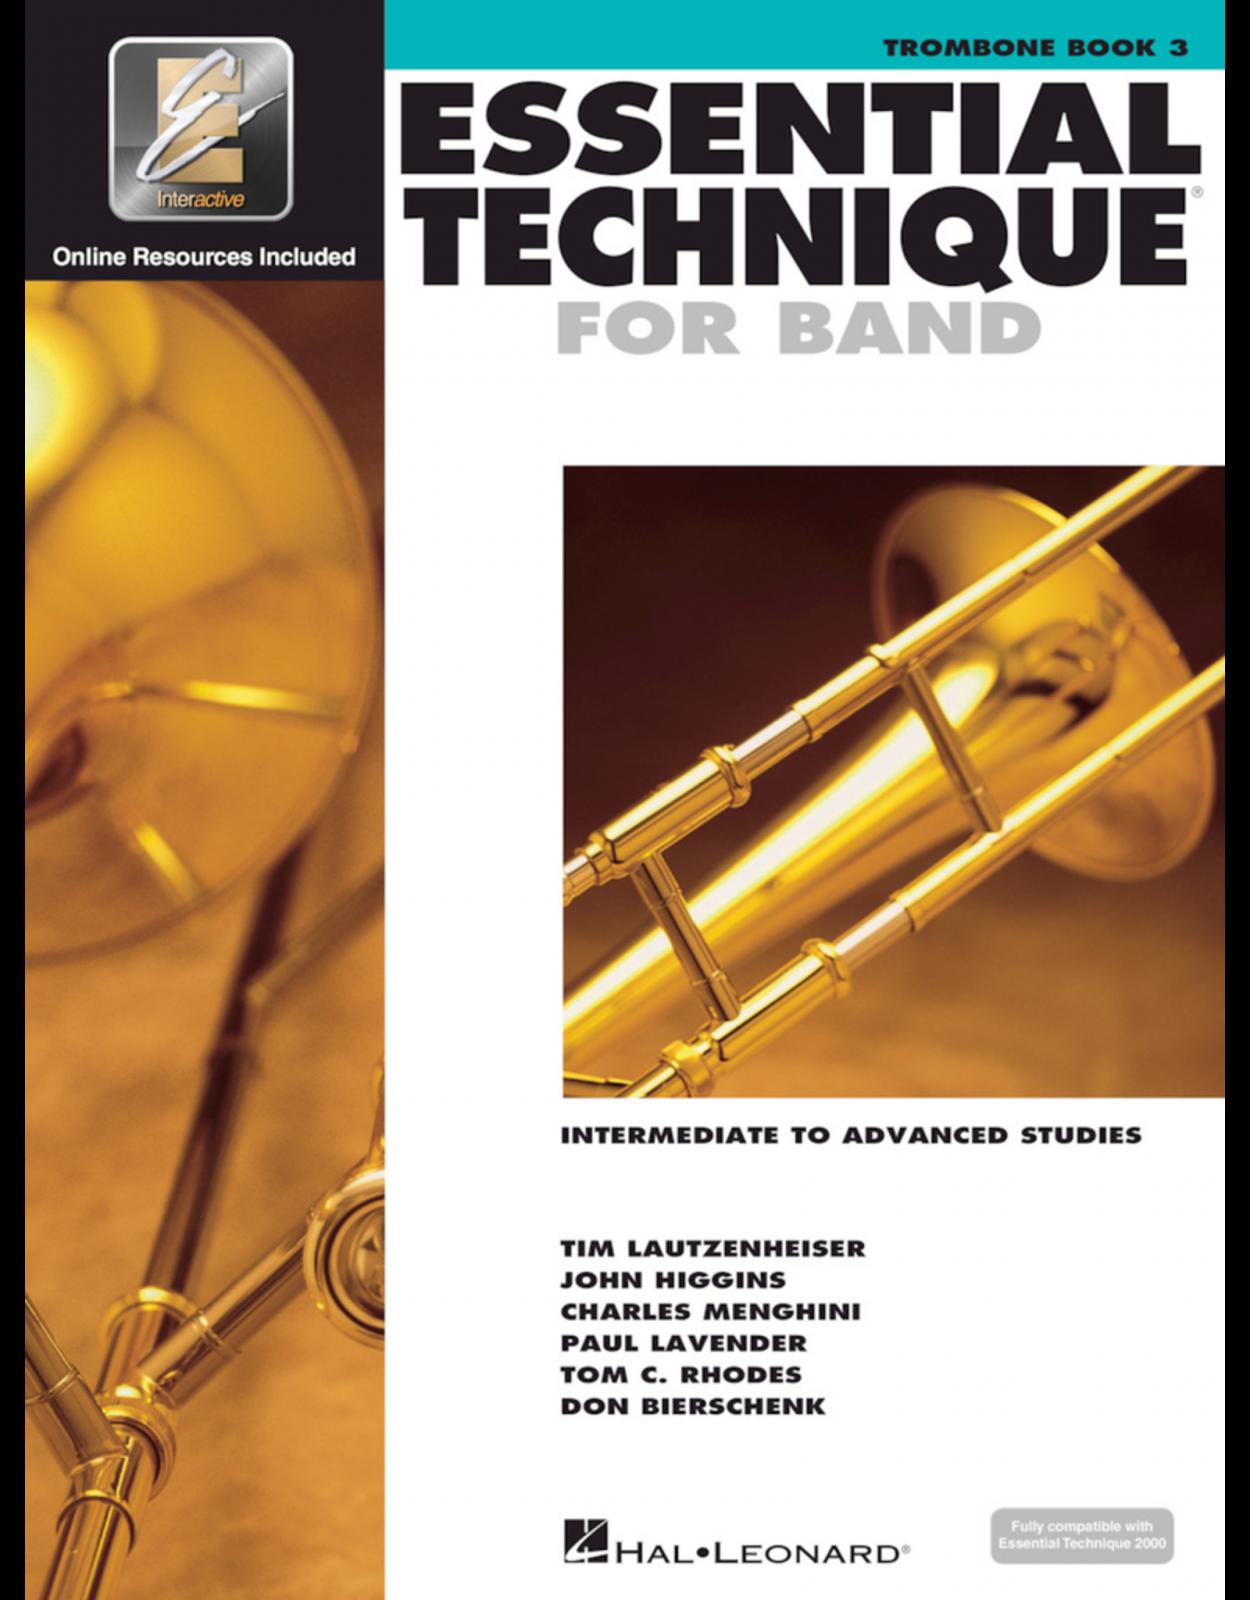 Trombone Book 3 Essential Technique for Band